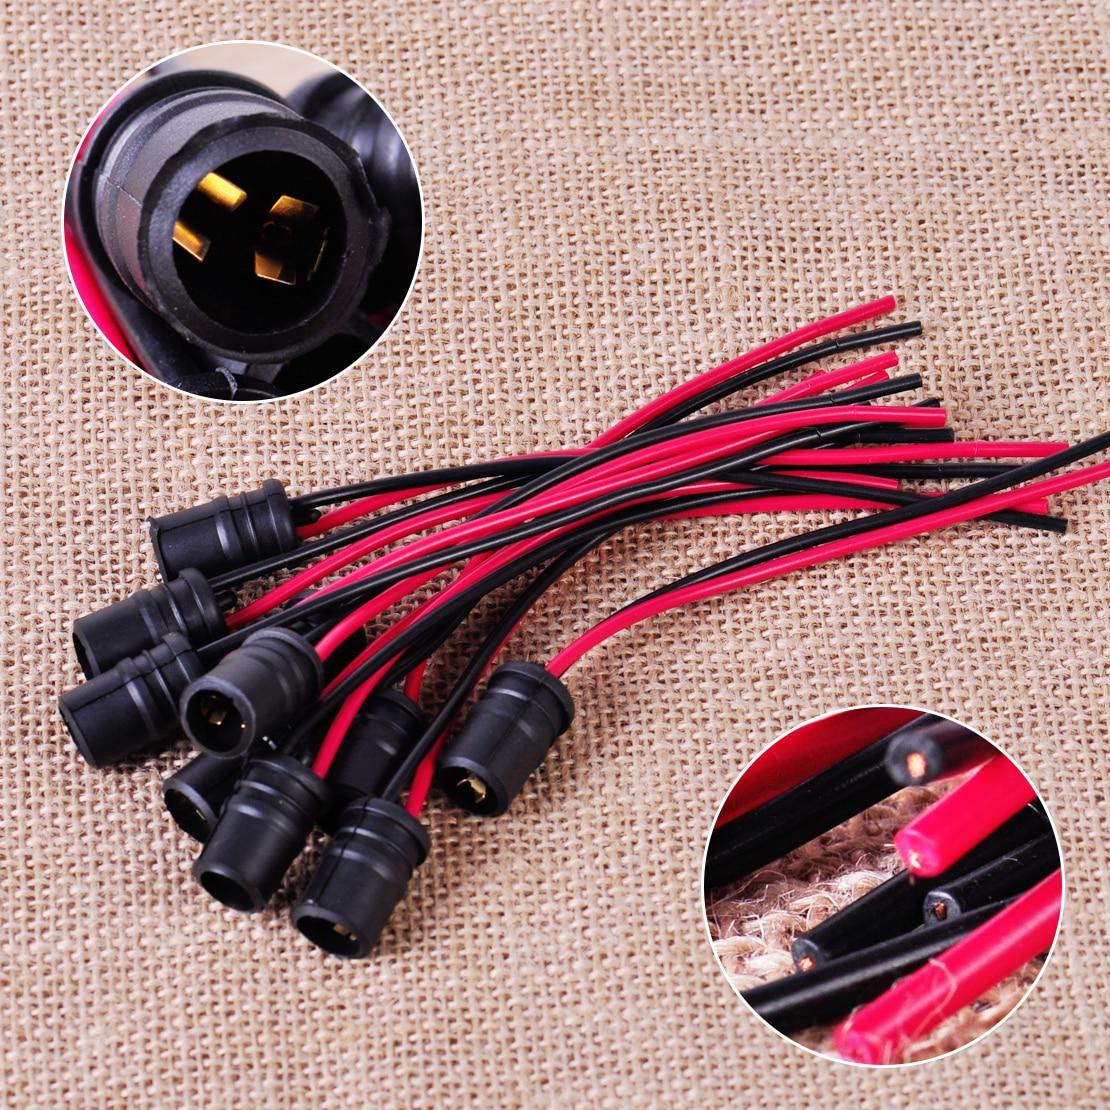 10pcs T10 W5W Light Bulb Socket Holder fit Car Truck Boat Soft Rubber Connectors